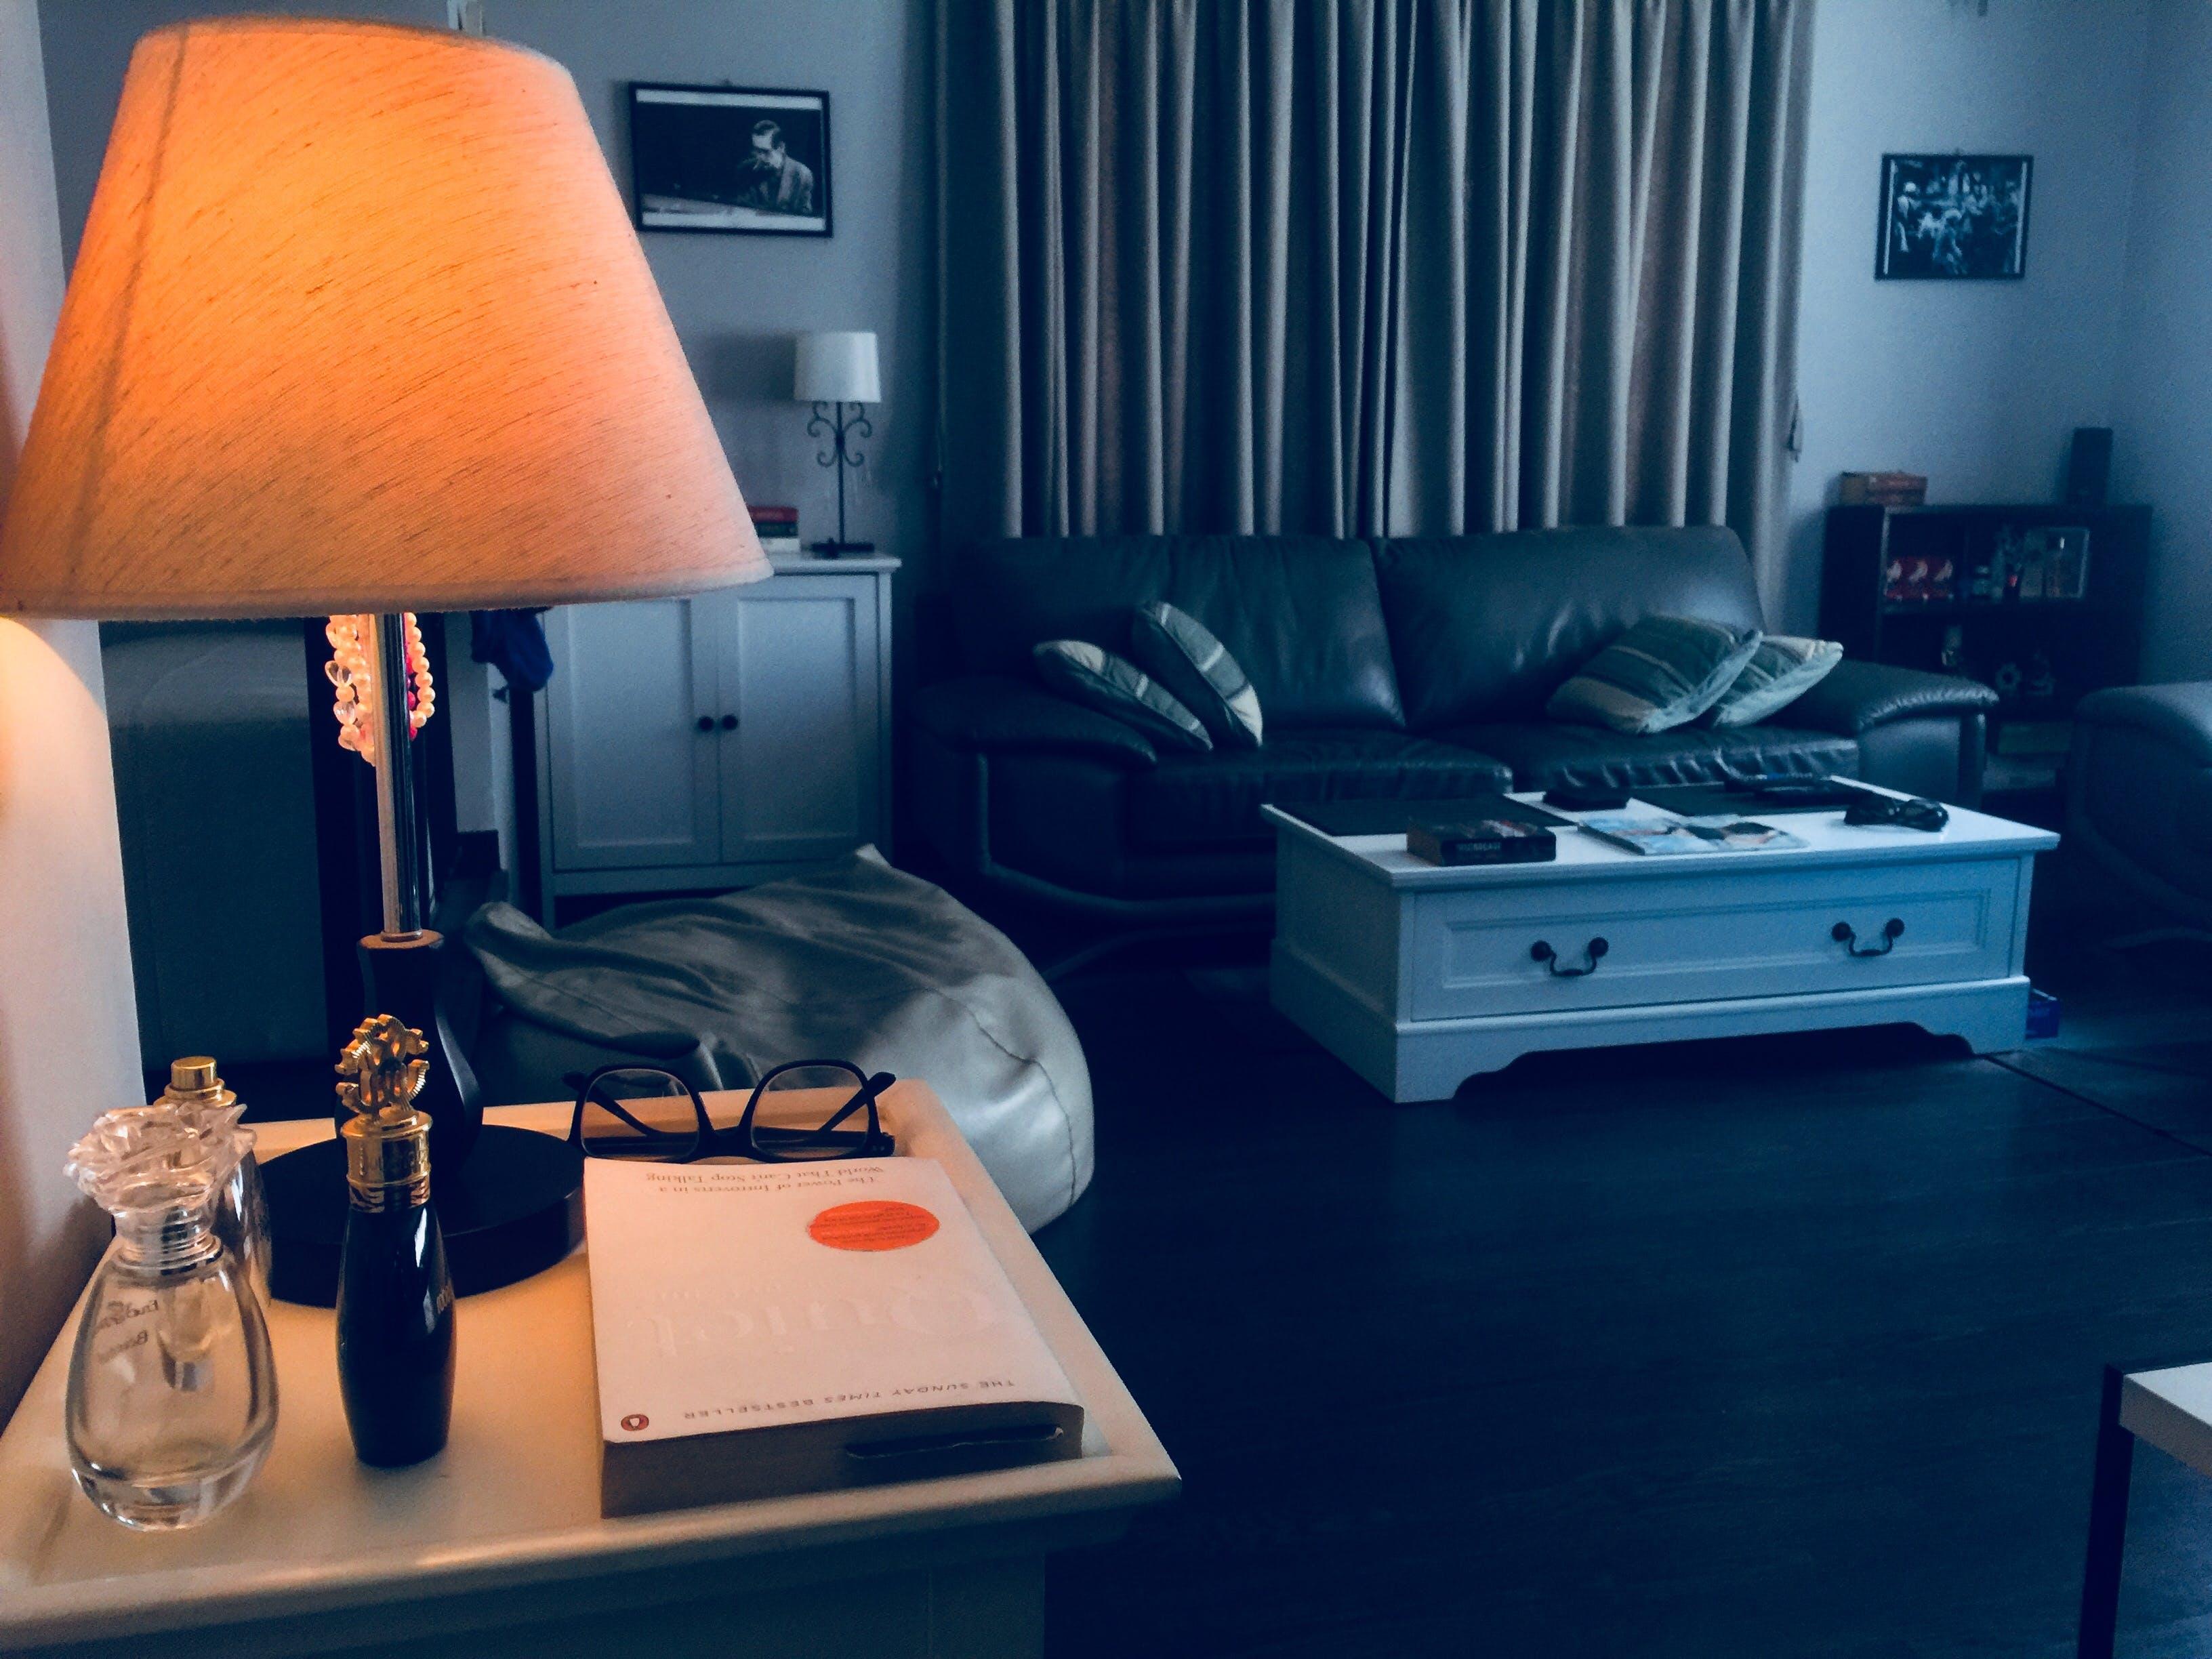 mobilechallenge, Throw Pillows, 室內, 室內設計 的 免費圖庫相片